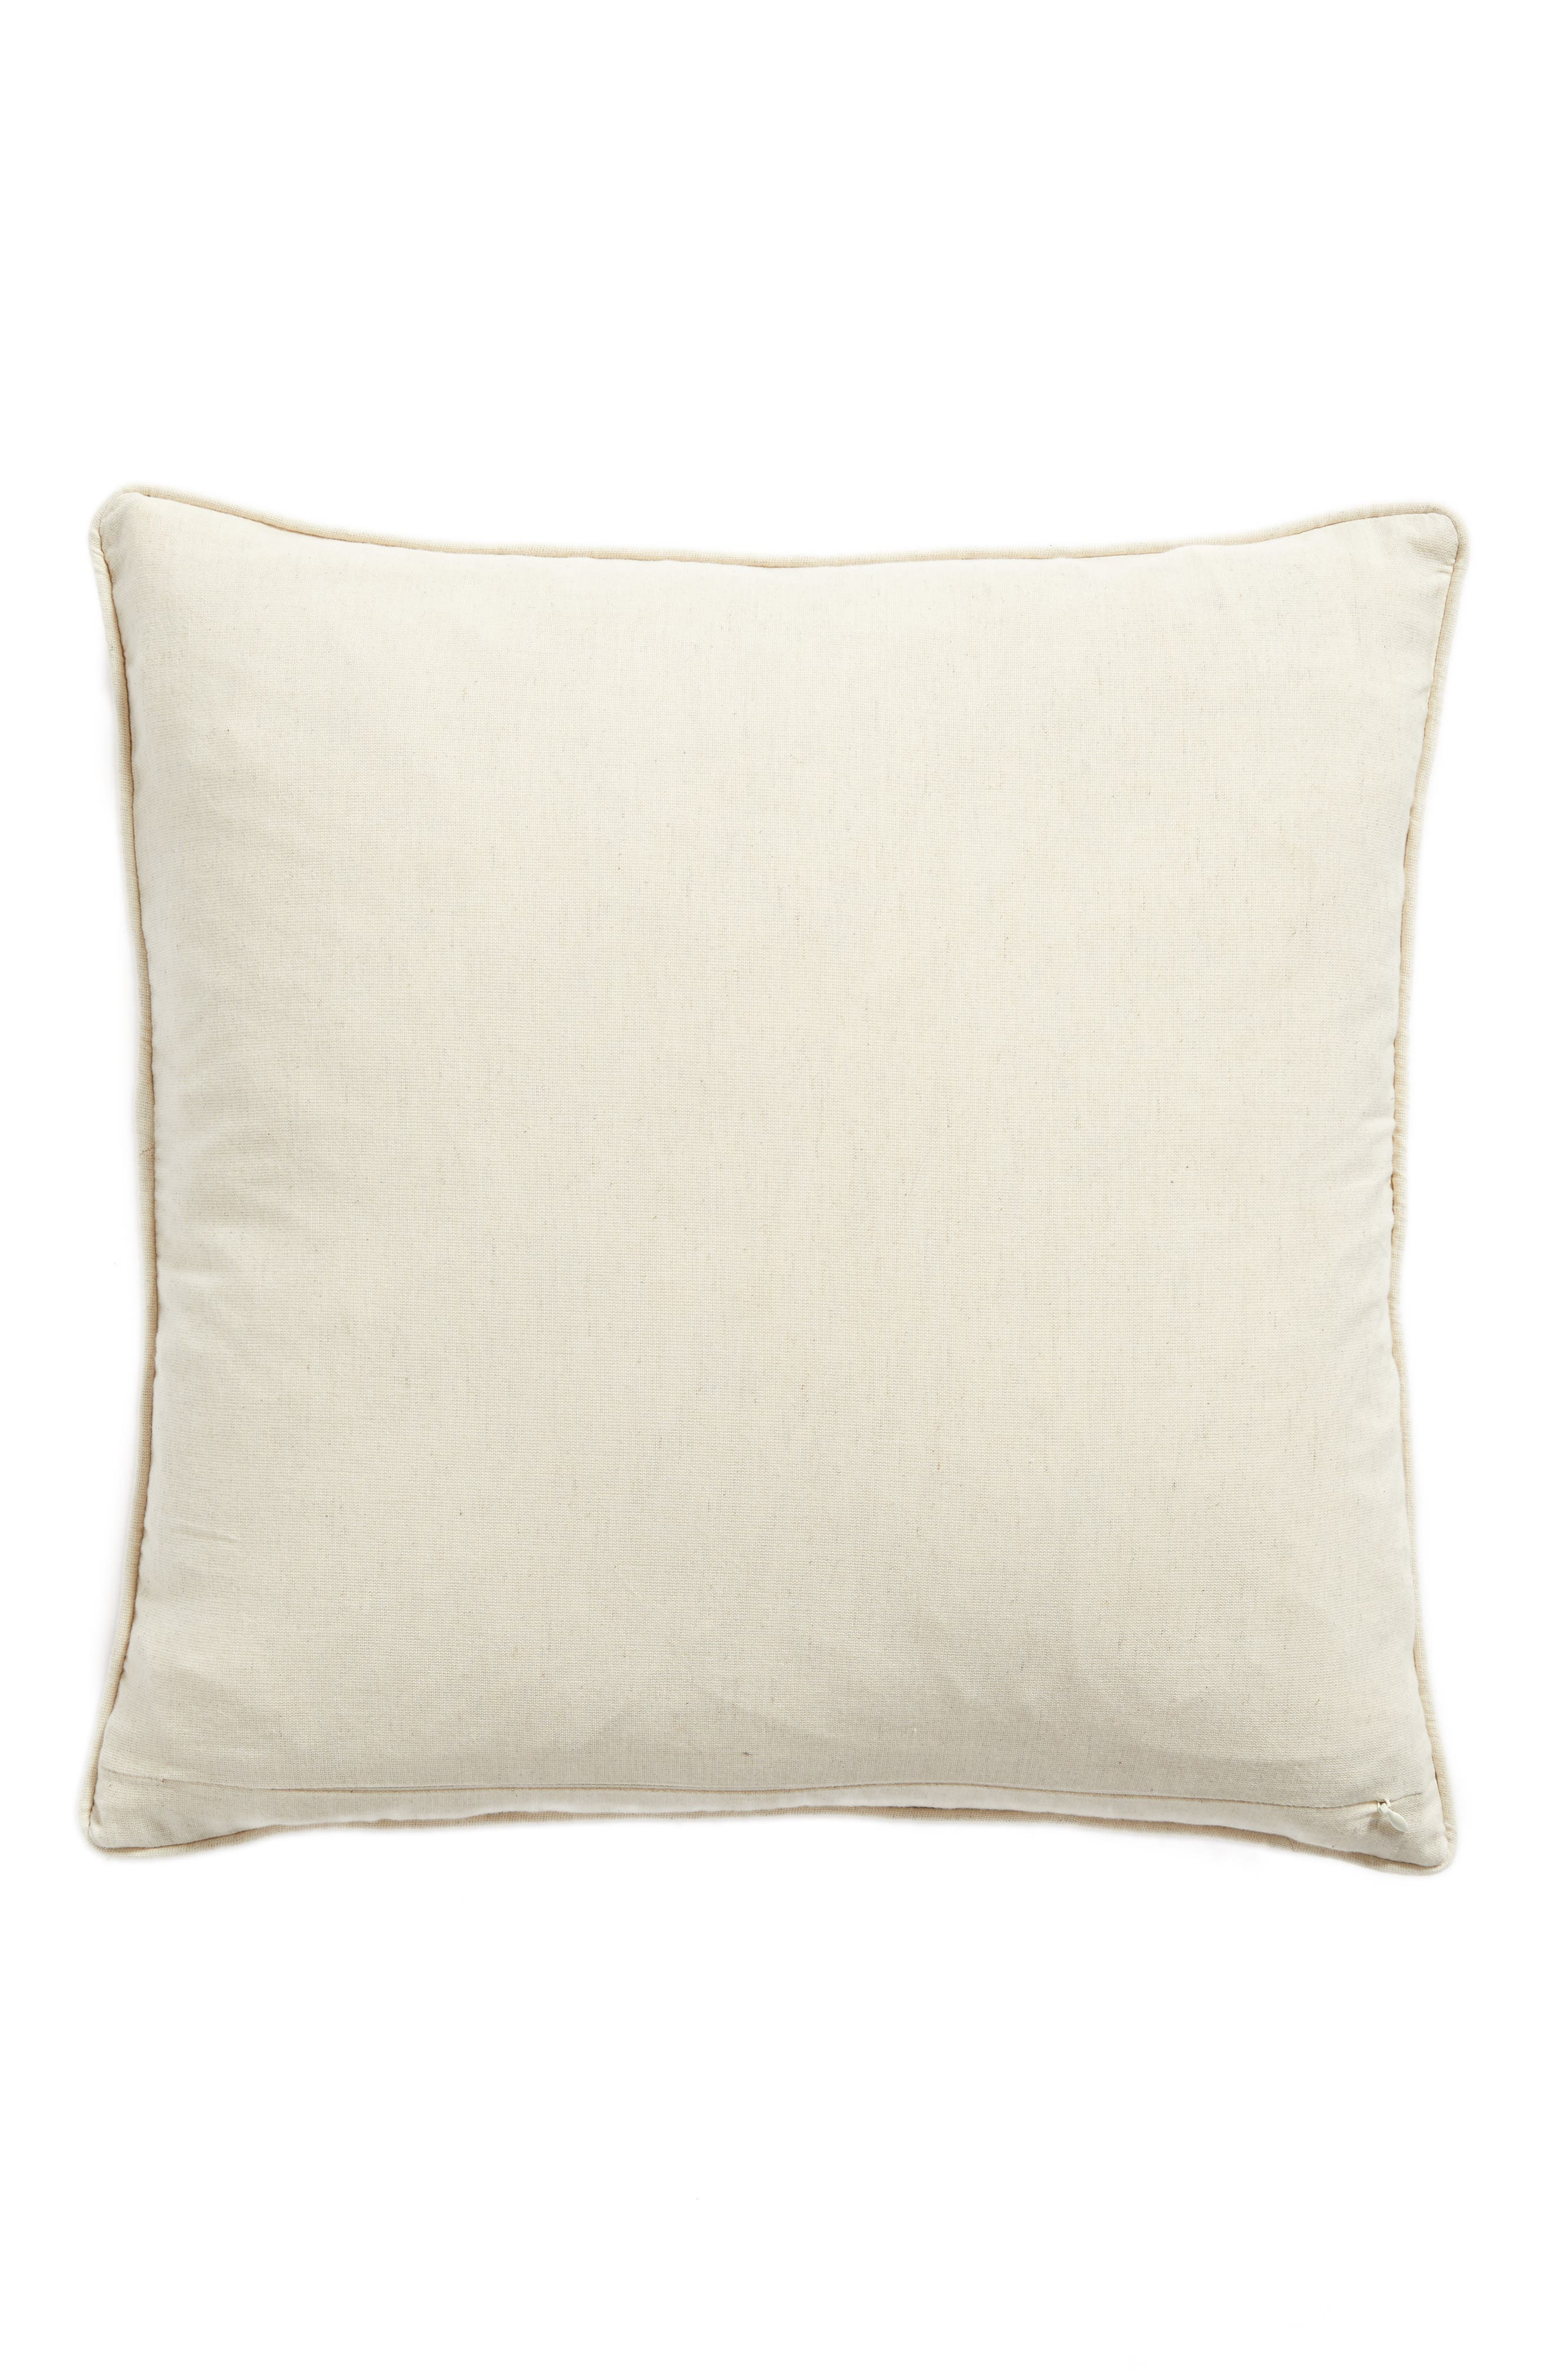 Velvet Cutout Accent Pillow,                             Alternate thumbnail 2, color,                             Blue Stellar Multi